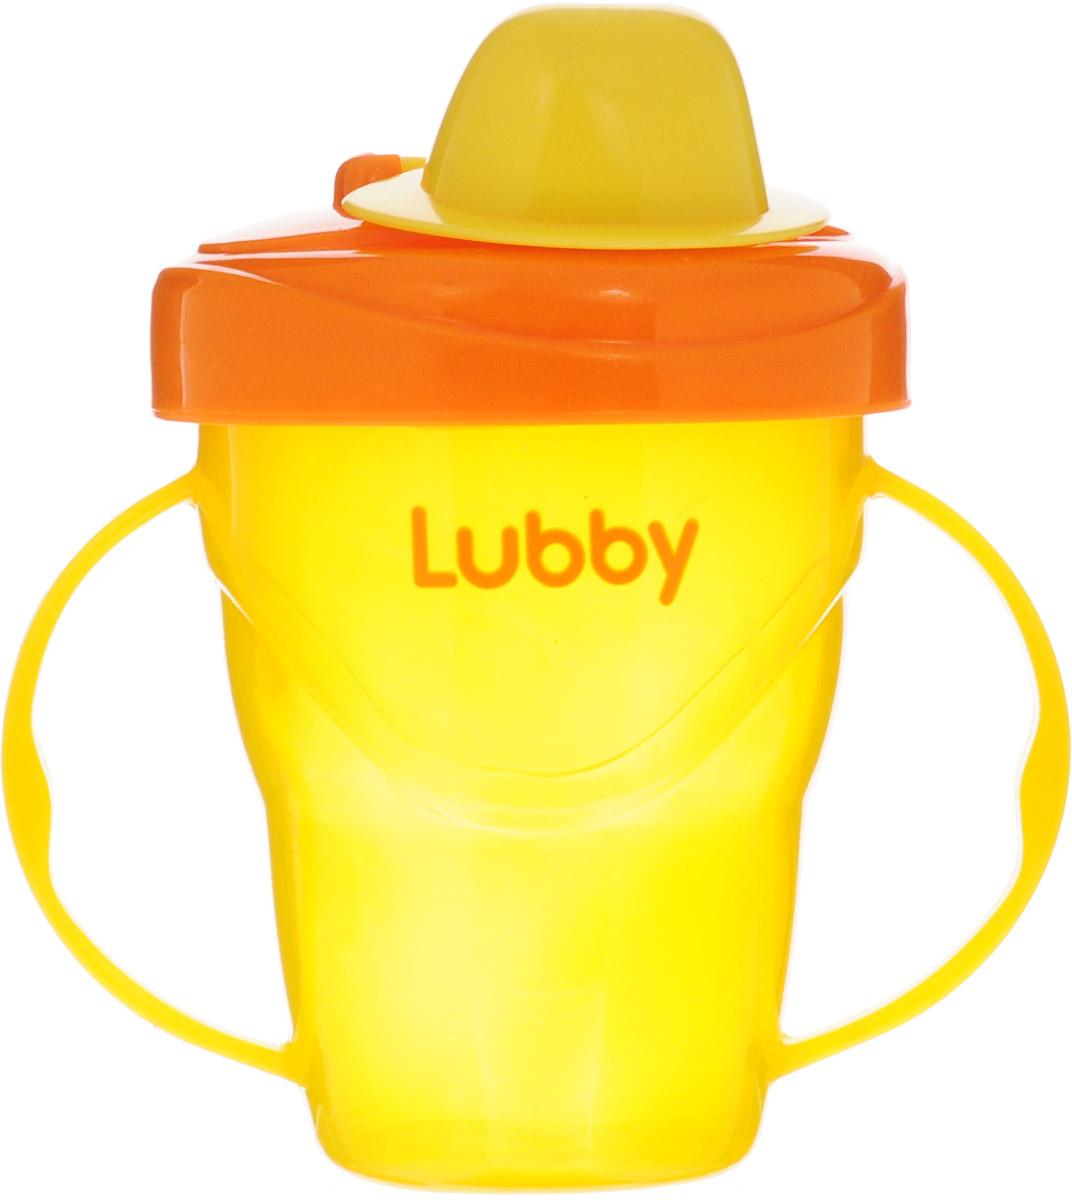 Lubby Поильник-непроливайка Классика от 6 месяцев цвет оранжевый желтый 175 мл lubby поильник с ручками just от 6 мес 180 мл lubby оранжевый